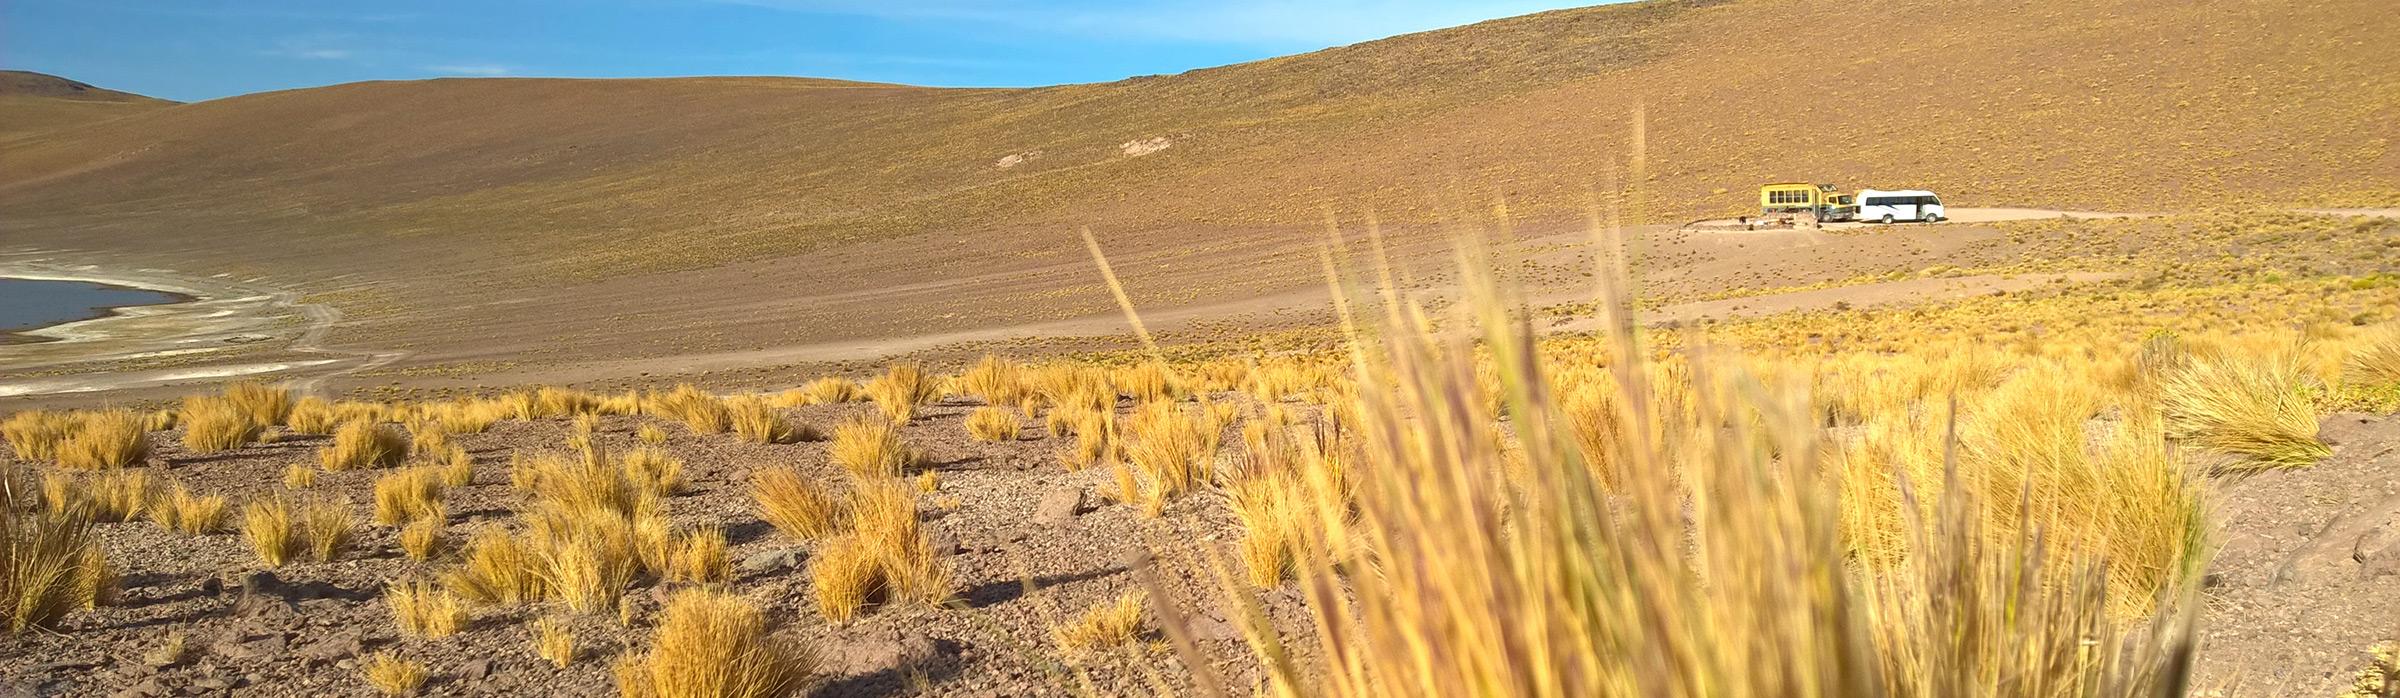 Chile Atacama Wüste Christian Bennat Life Judith Kautz Fotografie